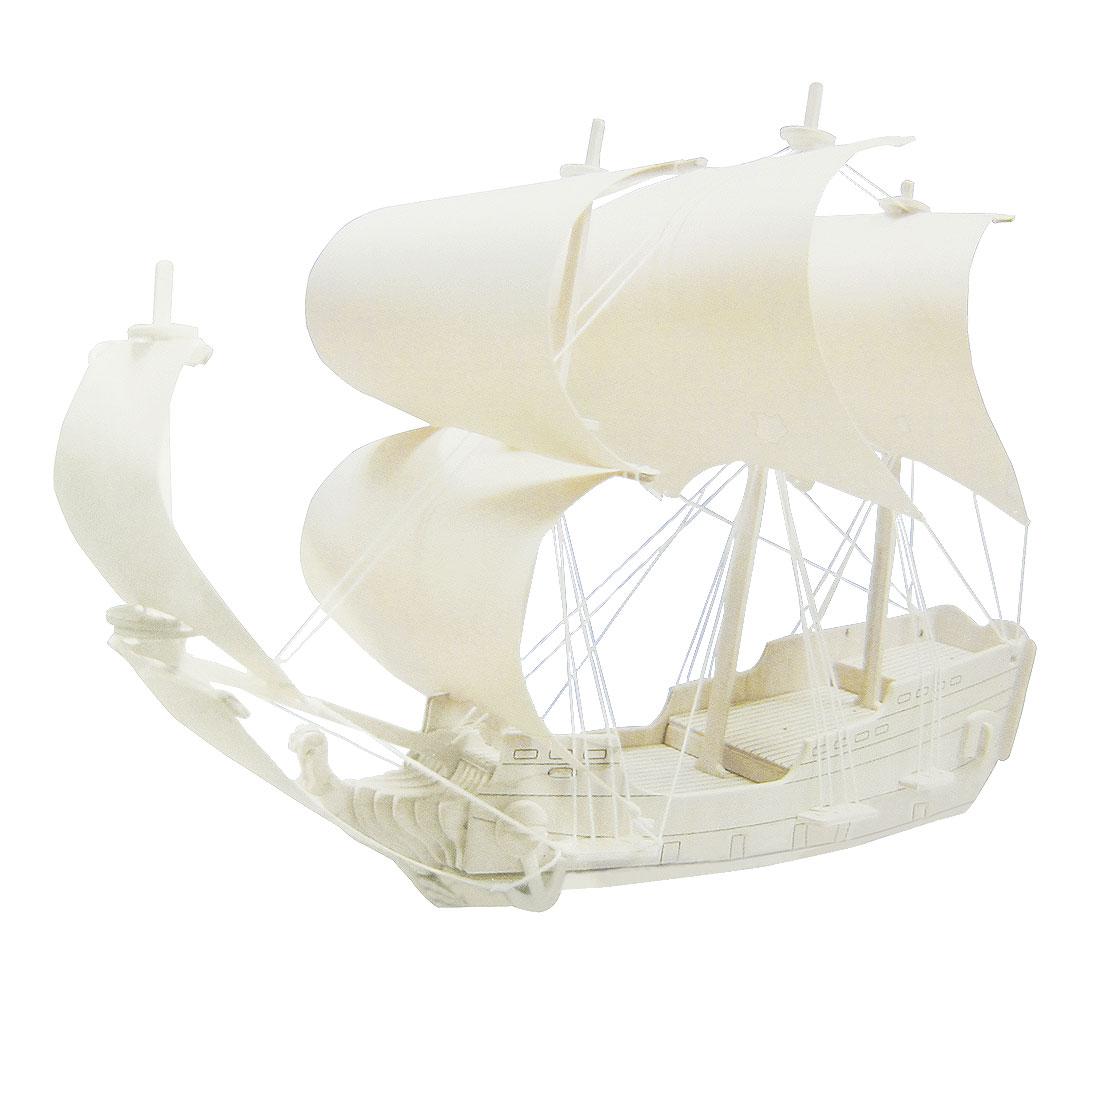 Sailing Ship Gothenburg Model Wood Construction Kit DIY Puzzle Toy Gift for